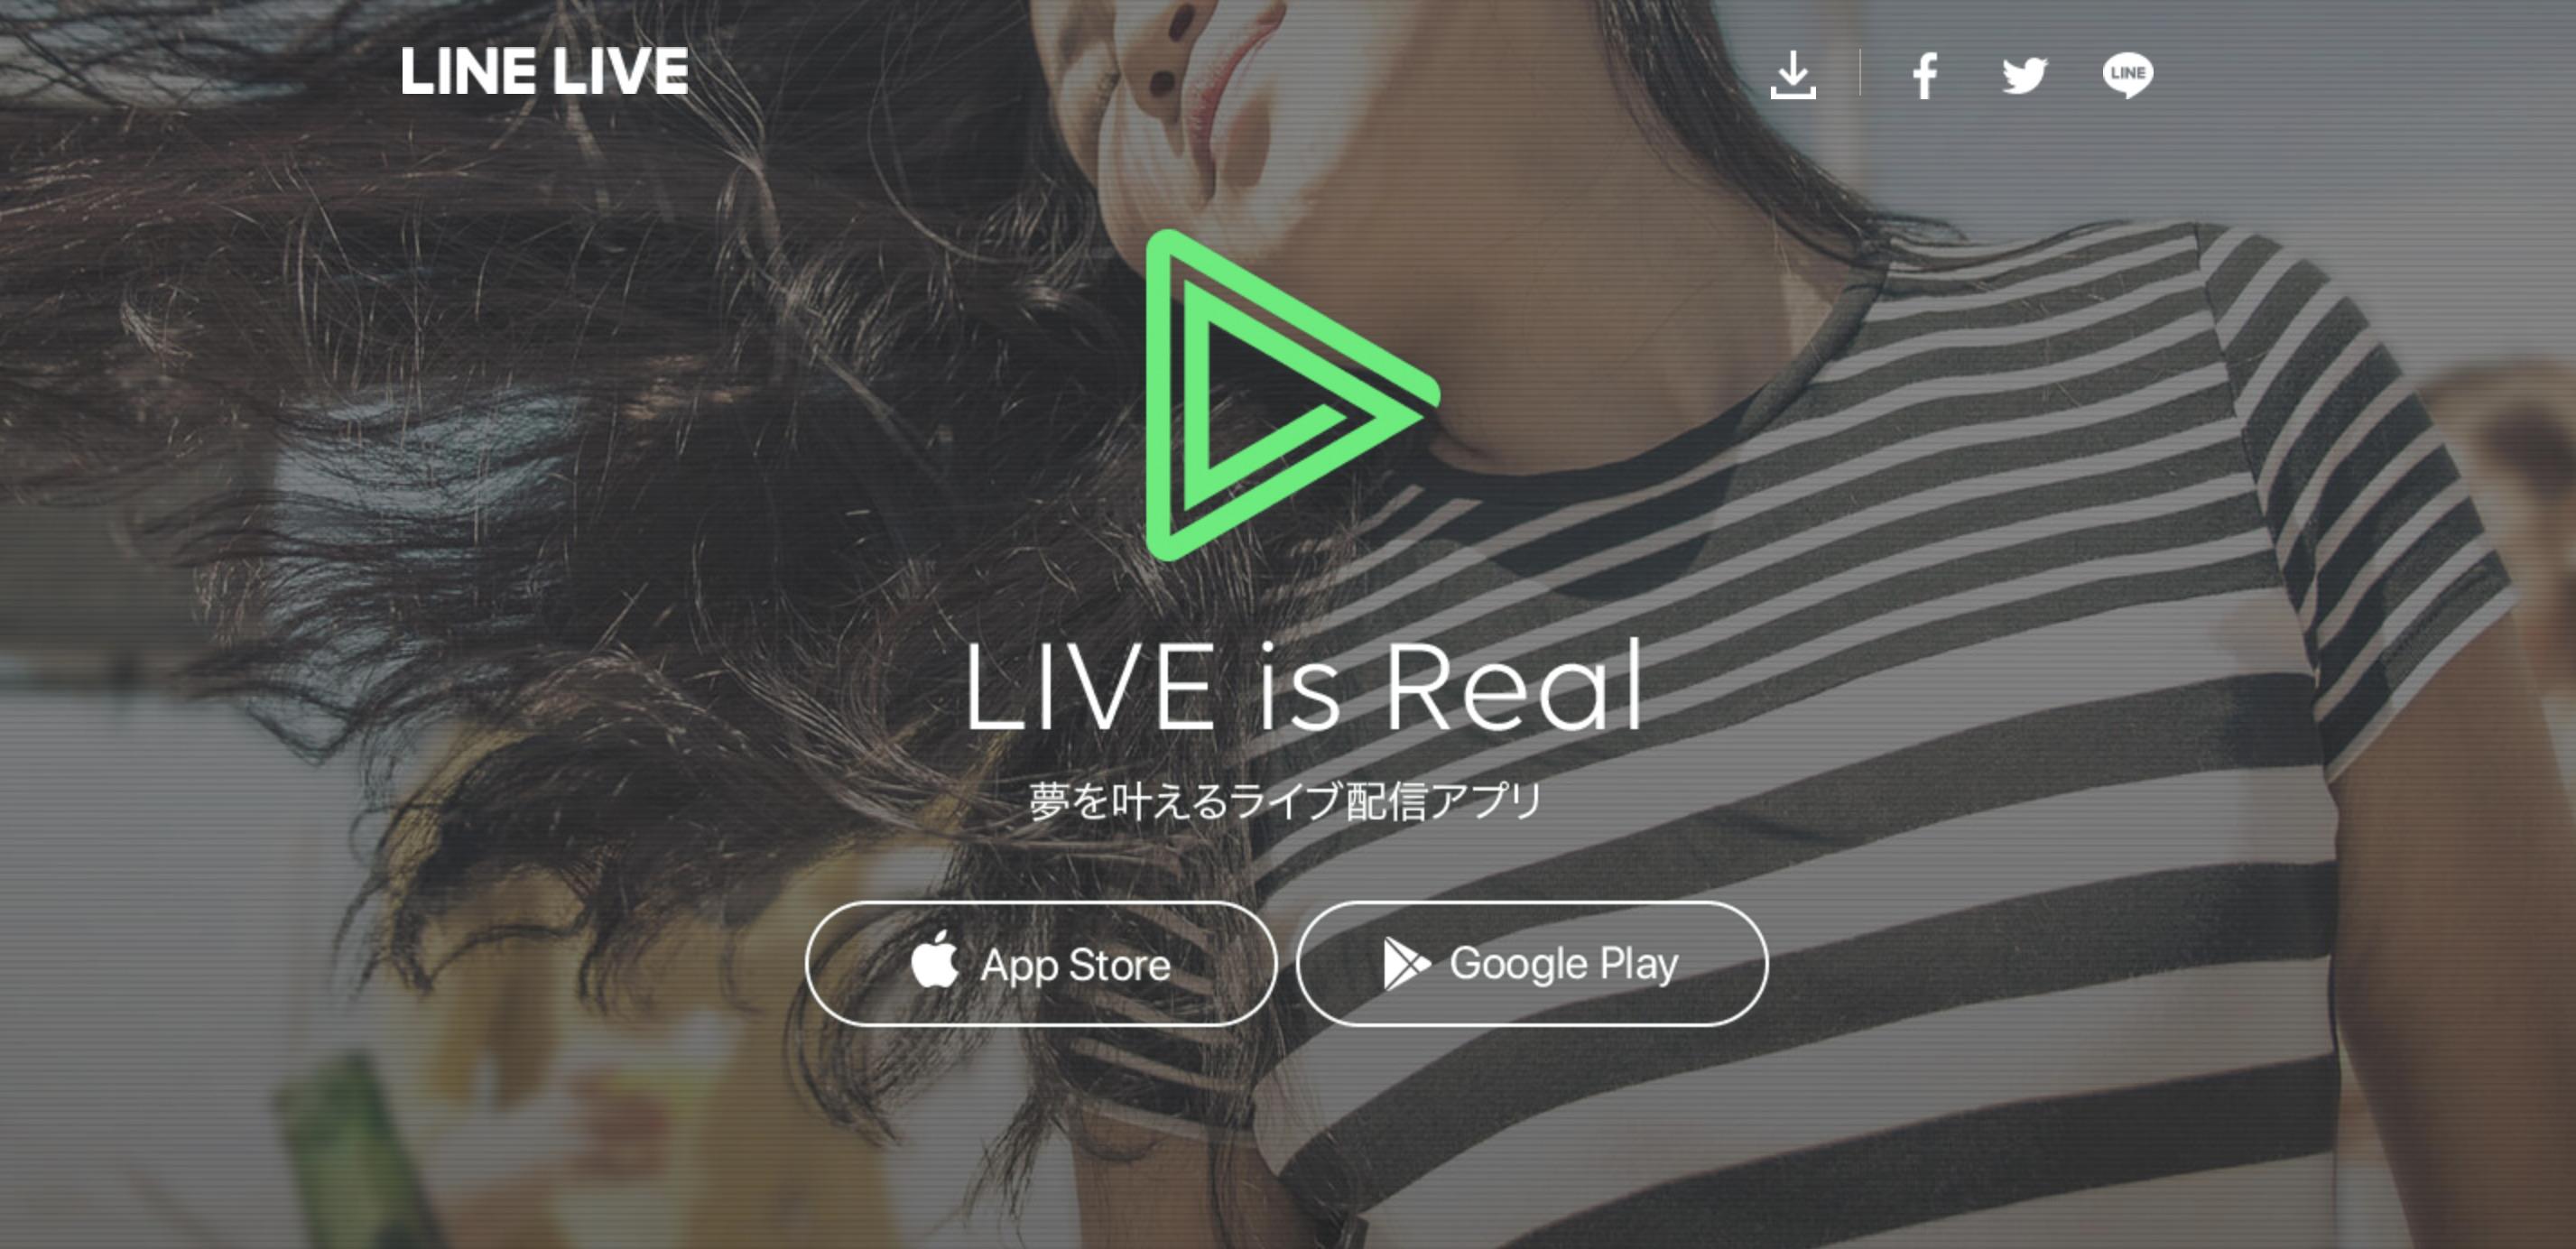 LINE LIVE 2.jpg